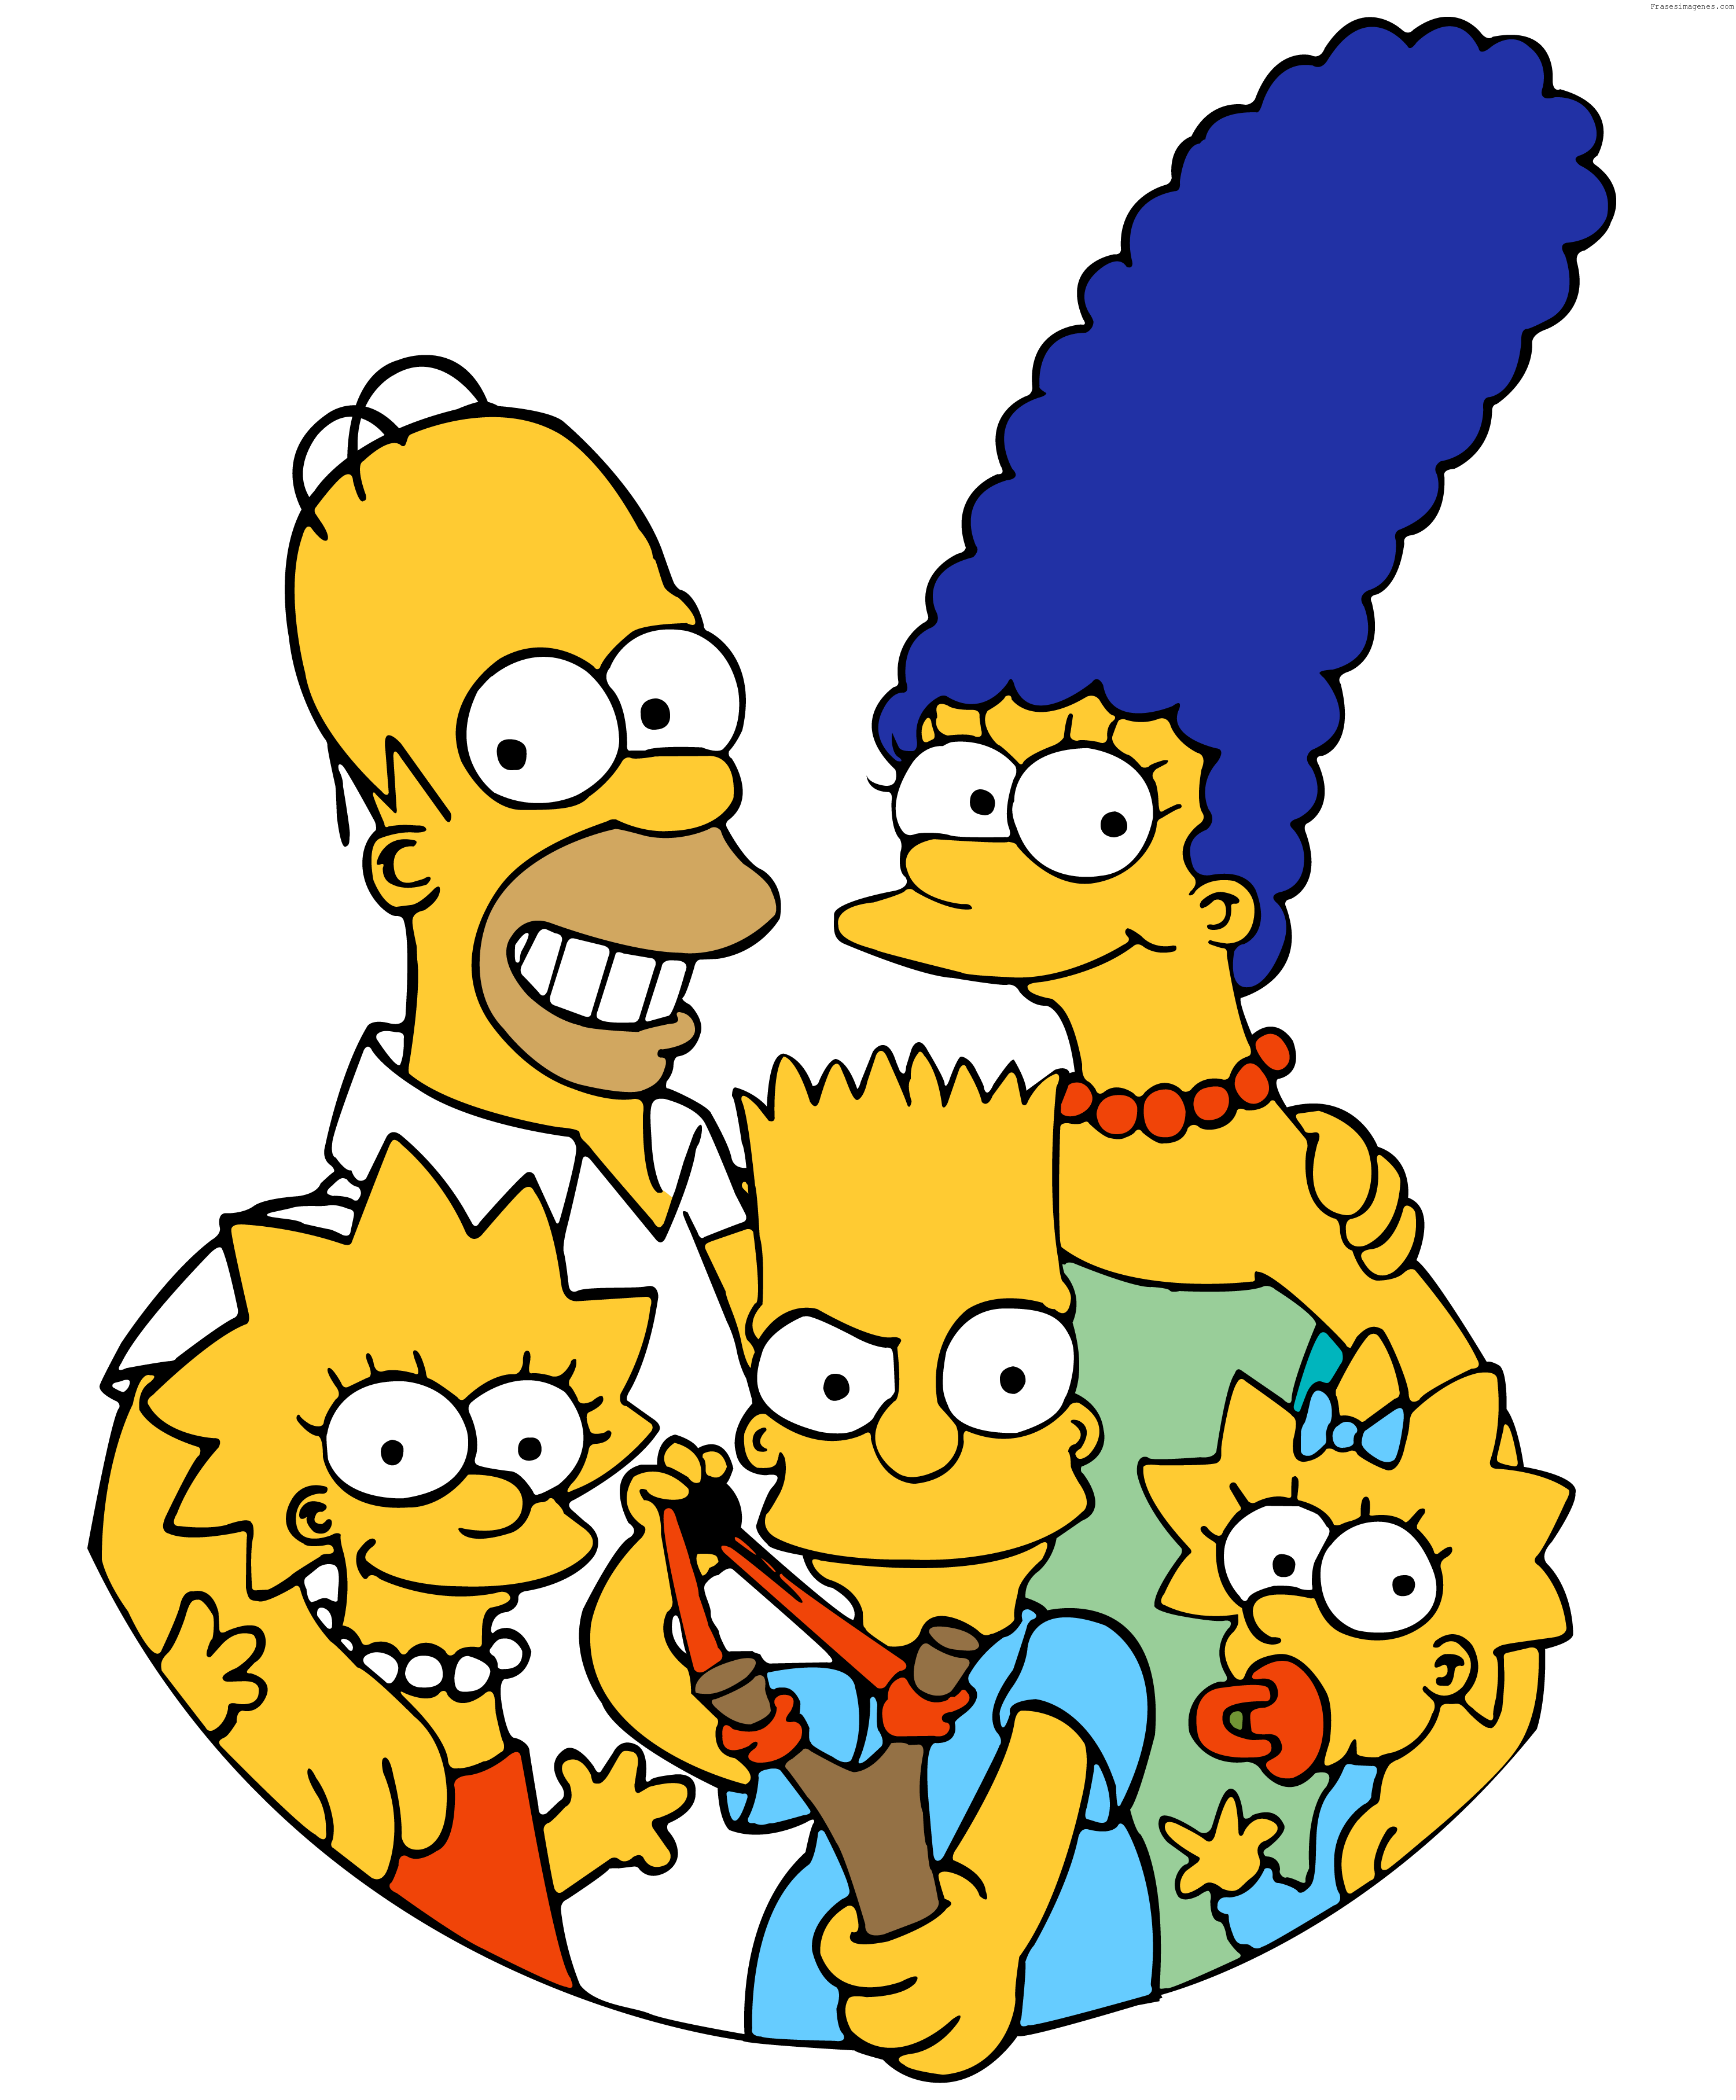 Imagenes De Los Simpsons Simpsons Cartoon The Simpsons Simpson Tv